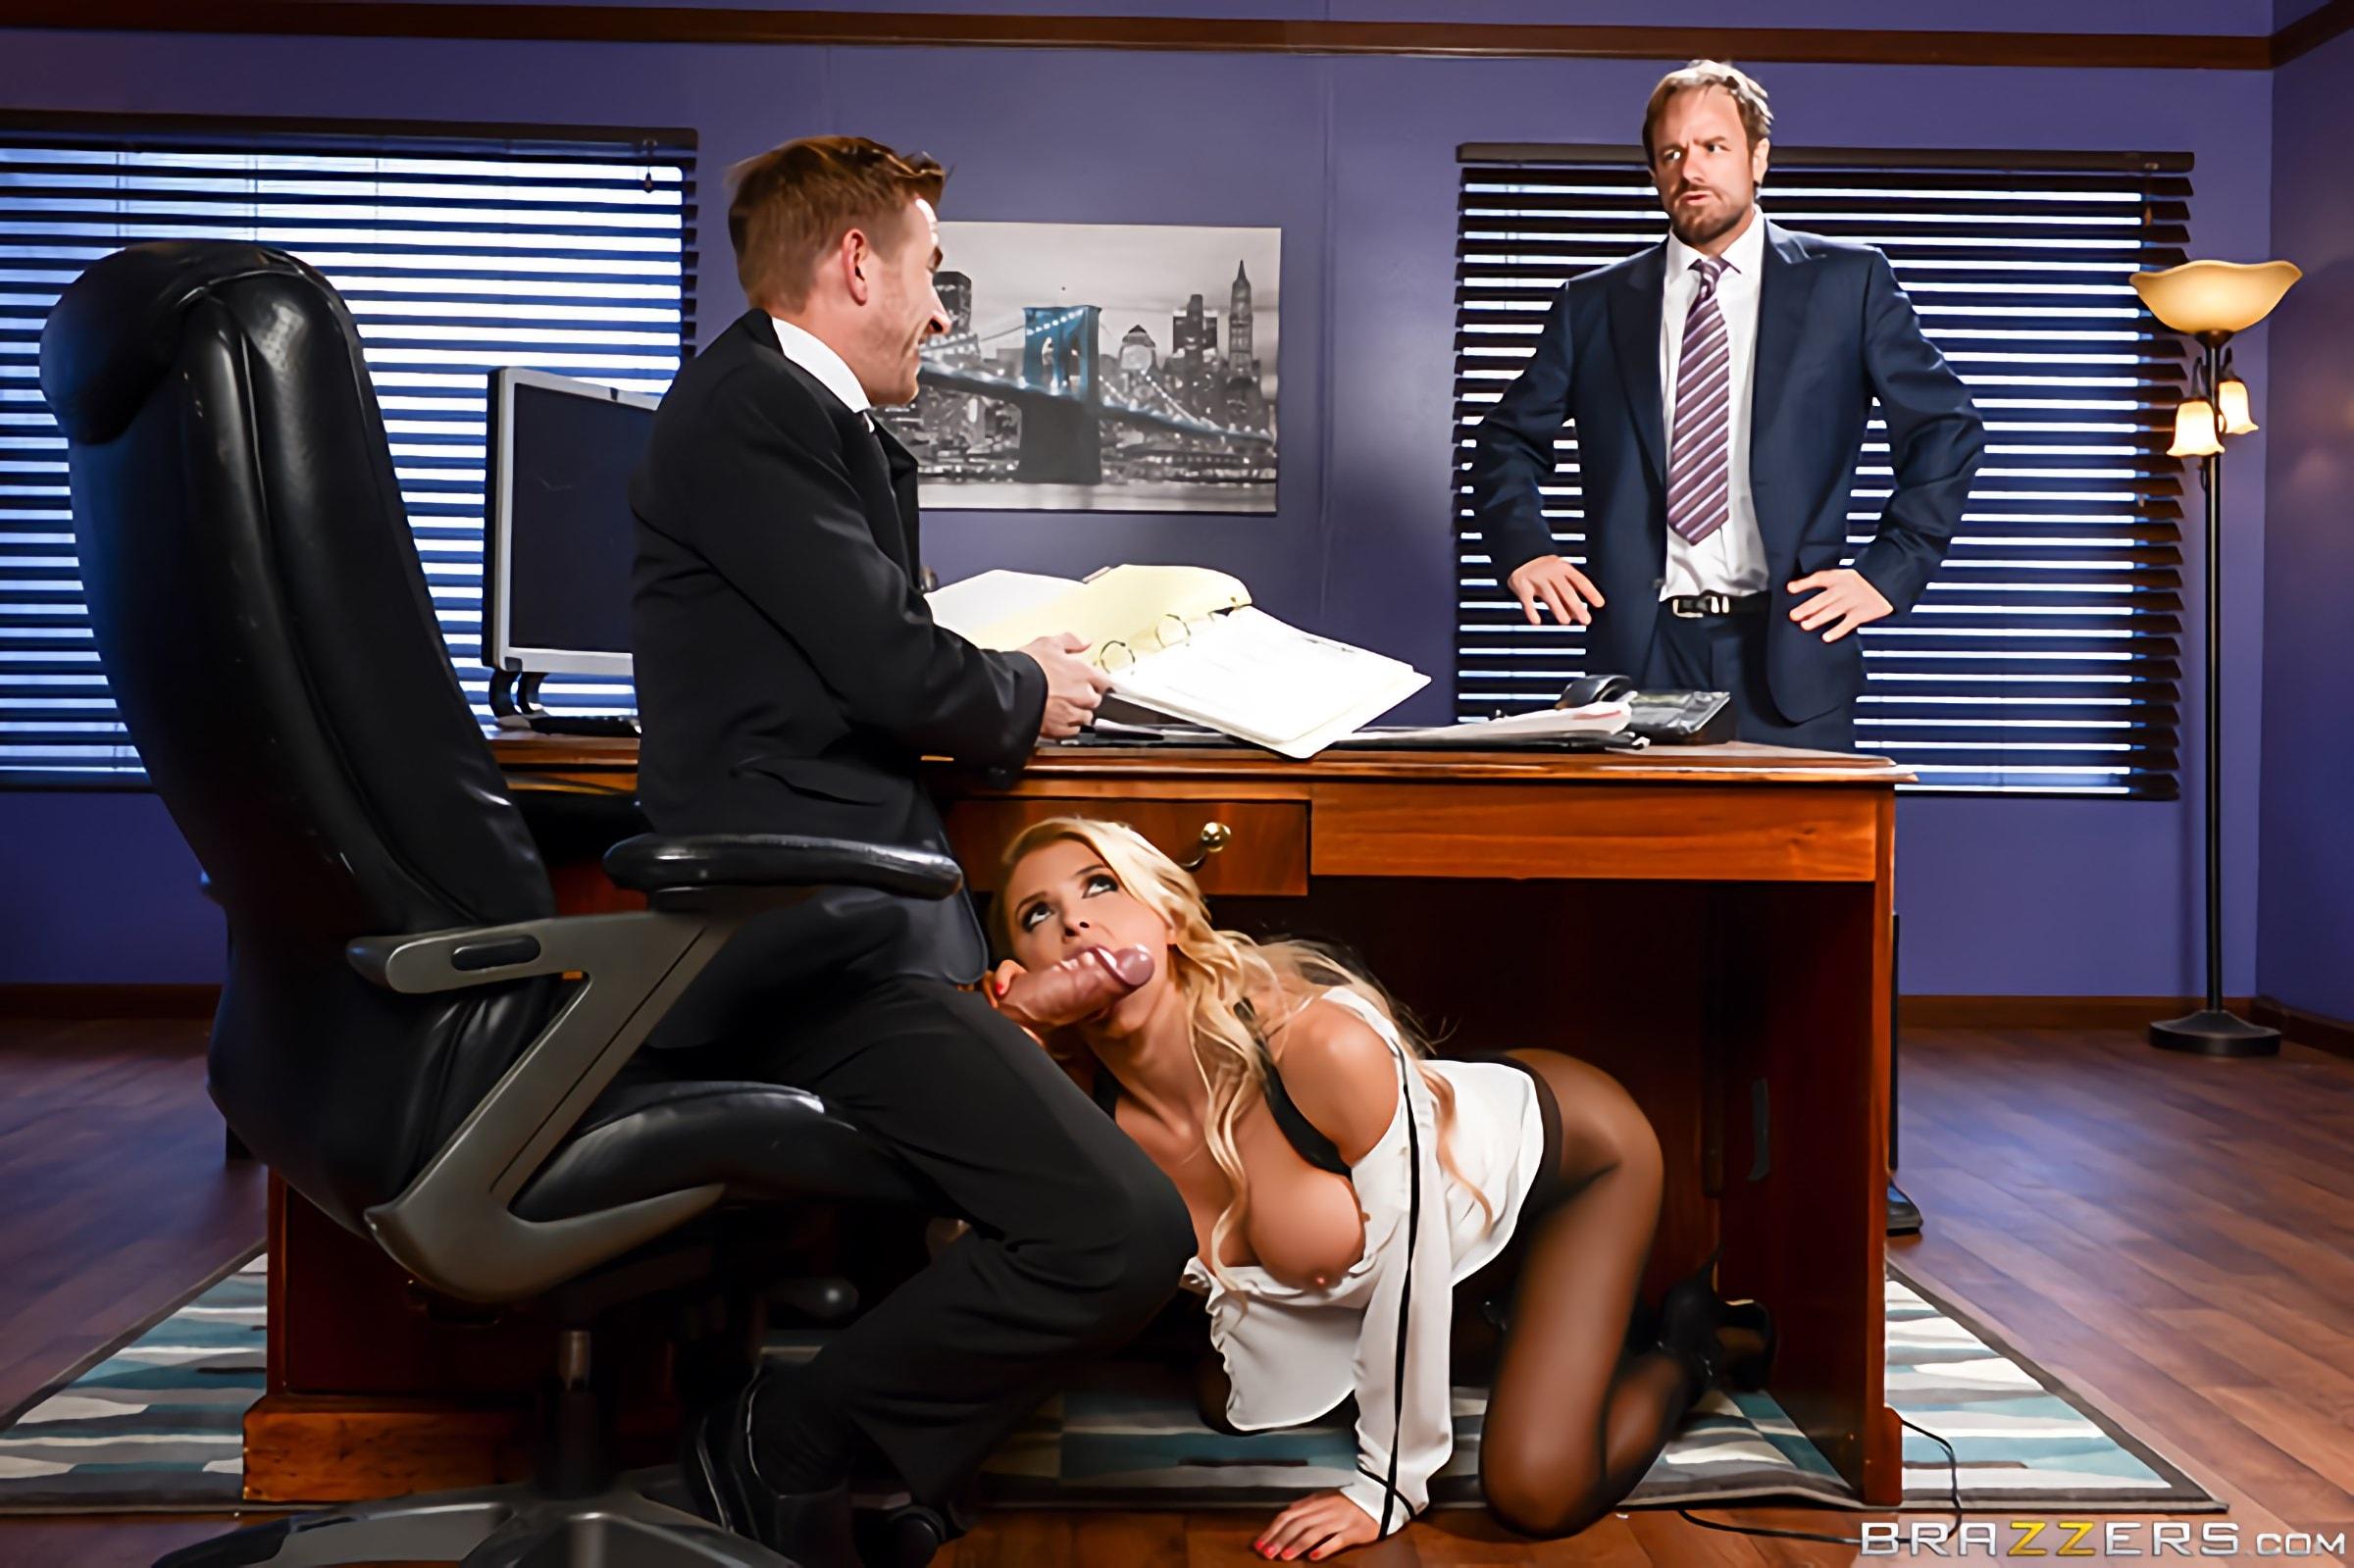 Brazzers 'Daddys Hardest Worker' starring Alix Lynx (Photo 2)